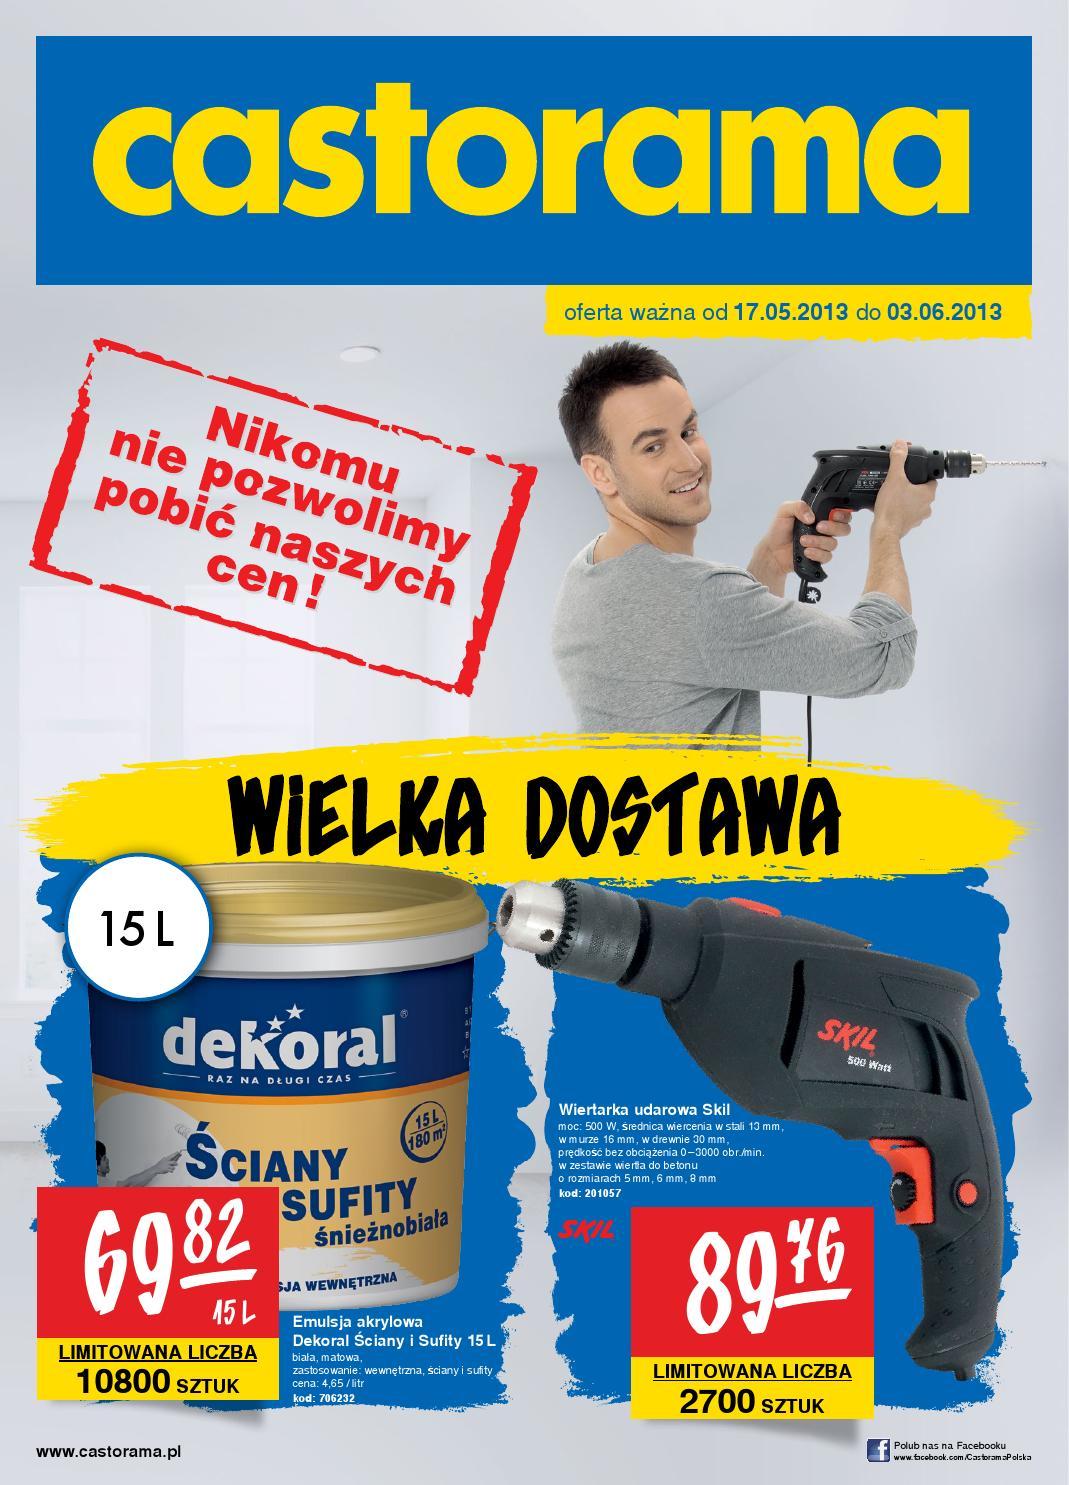 castorama gazetka 20130517 by micha wejwoda issuu. Black Bedroom Furniture Sets. Home Design Ideas